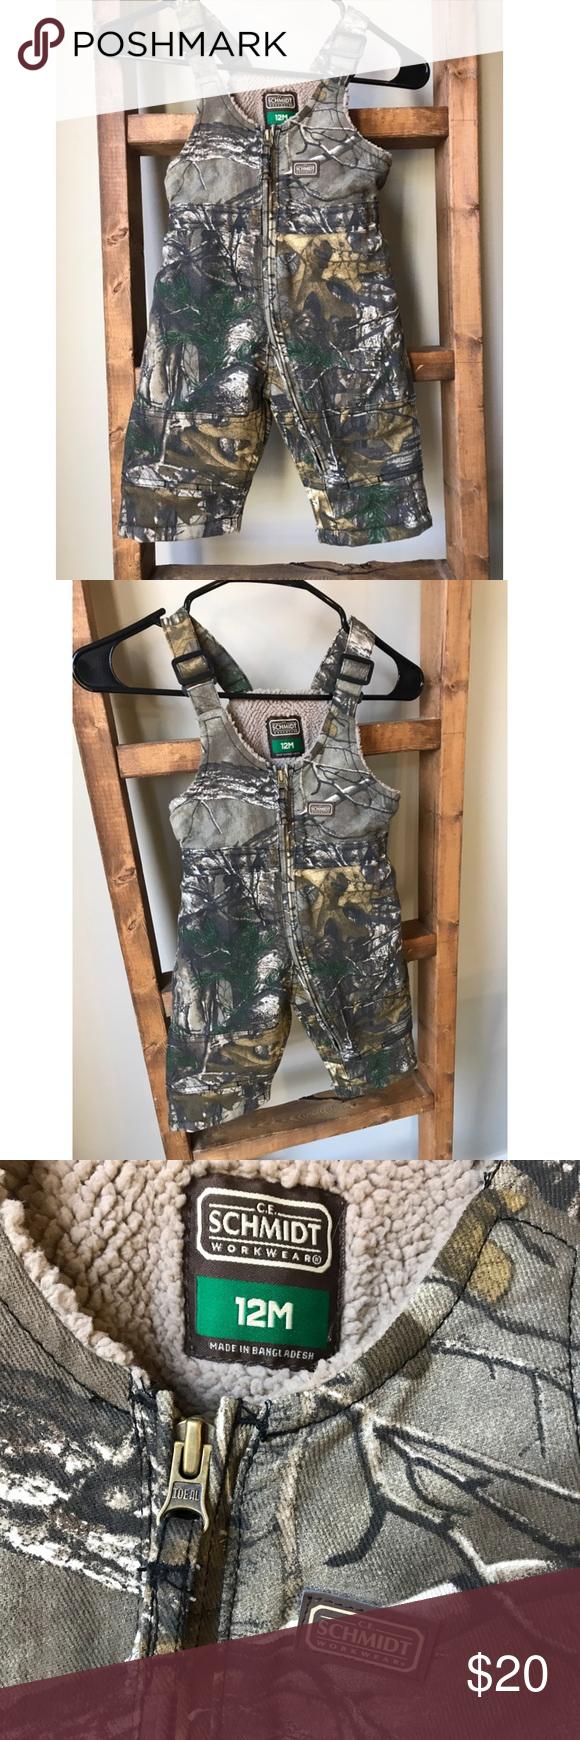 c e schmidt work wear insulated zip up overalls in 2020 on insulated work overalls id=65570